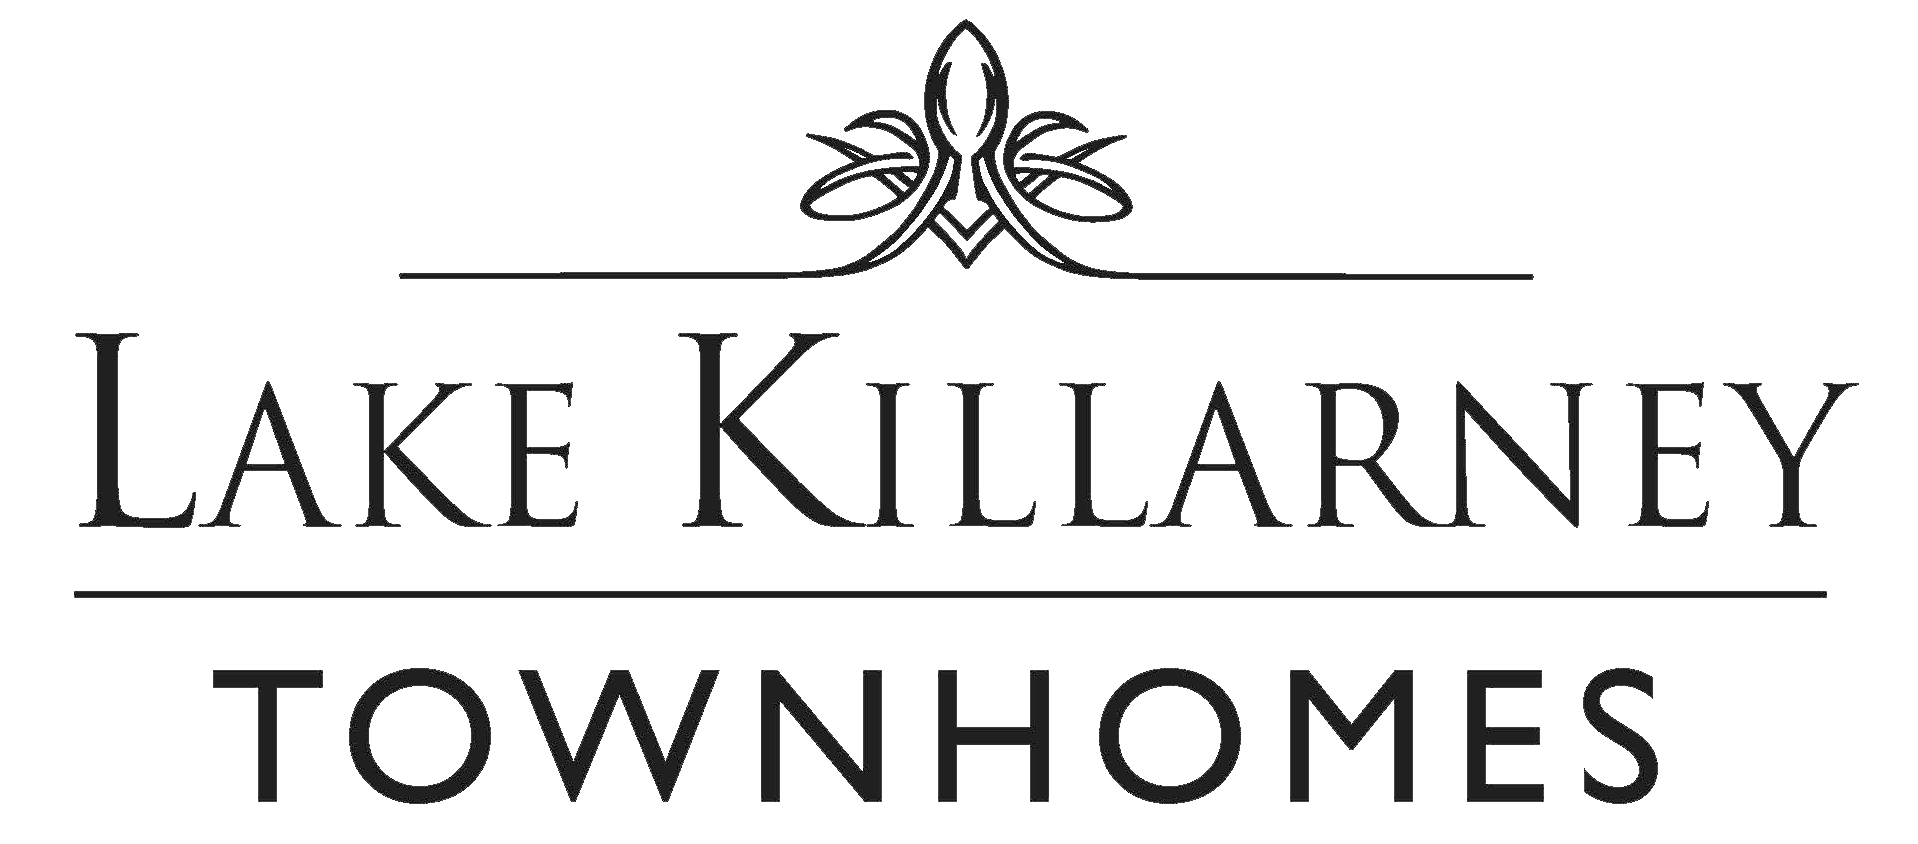 Lake Killarney Townhomes